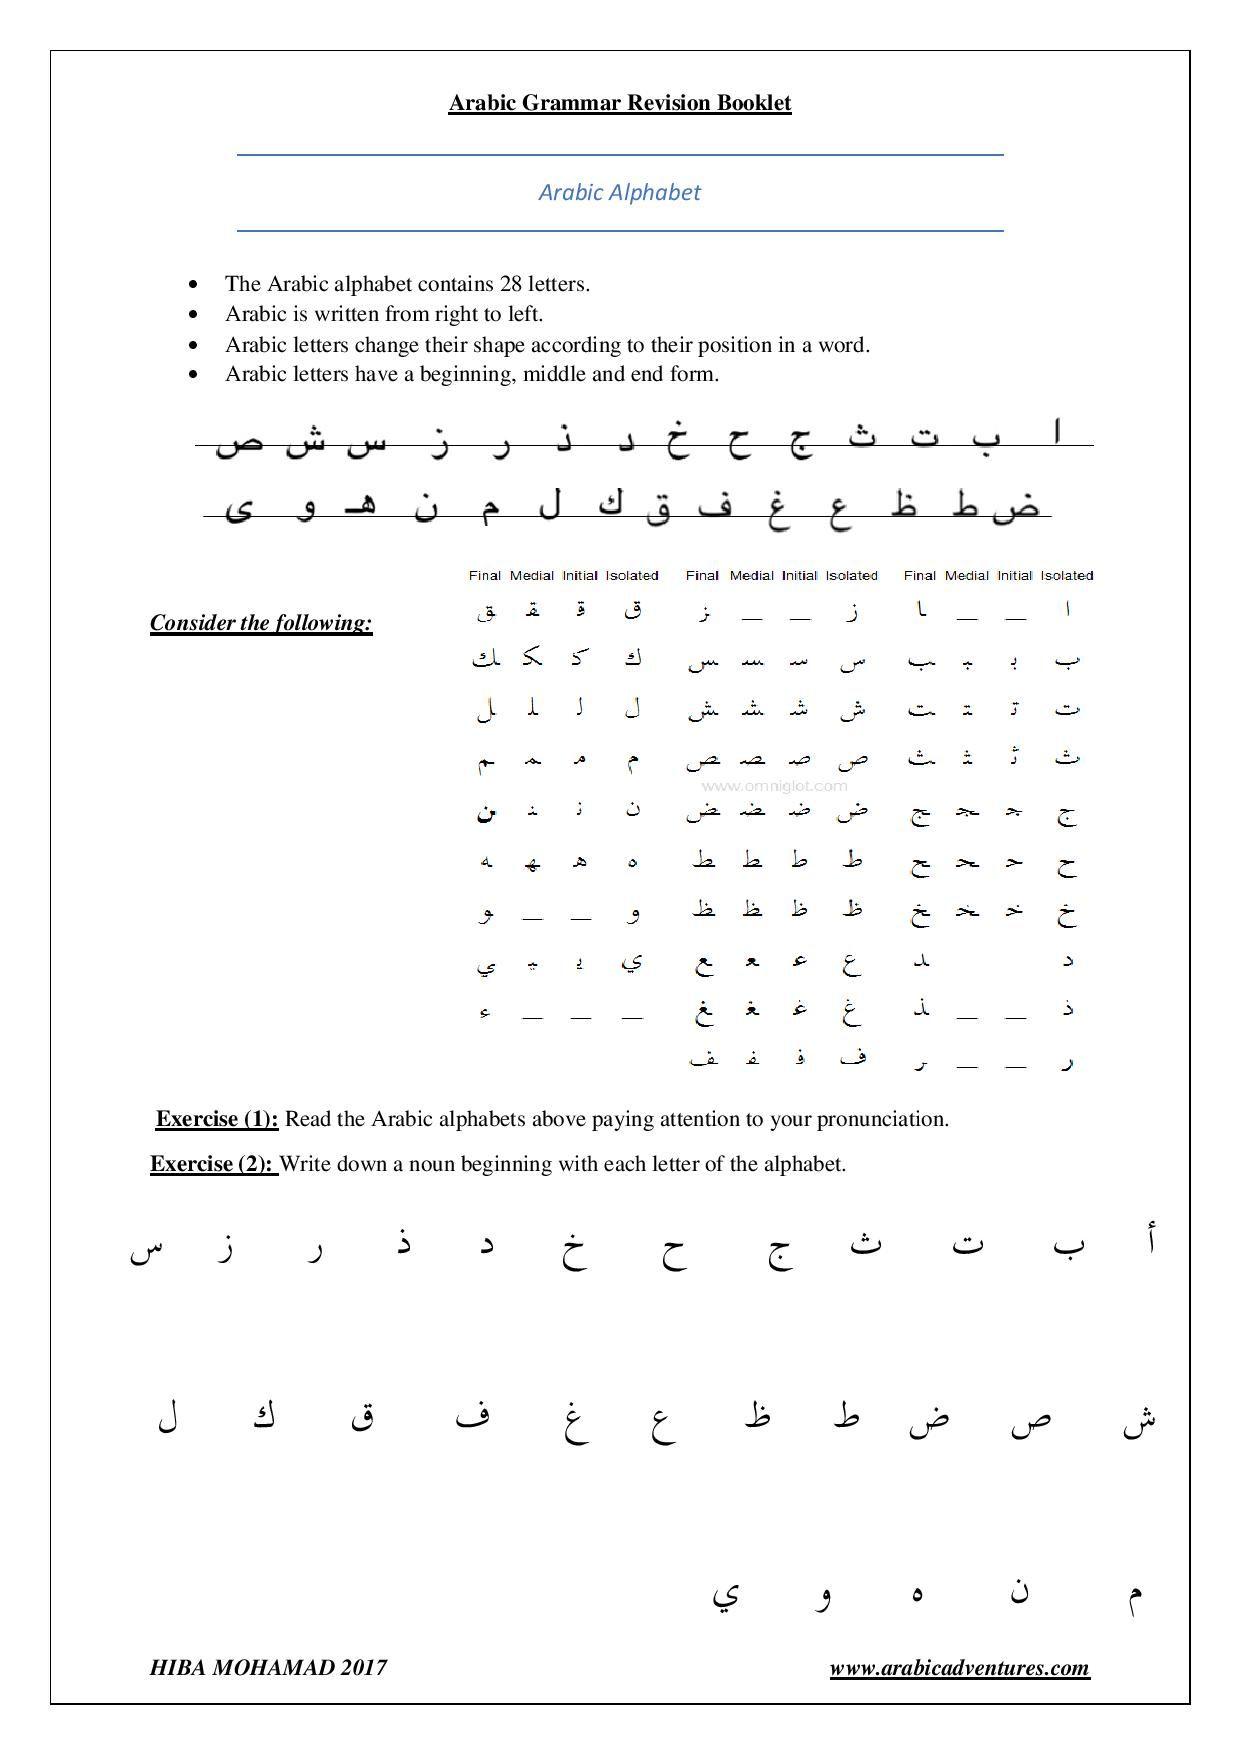 Arabic Alphabets Worksheet Abicadventures